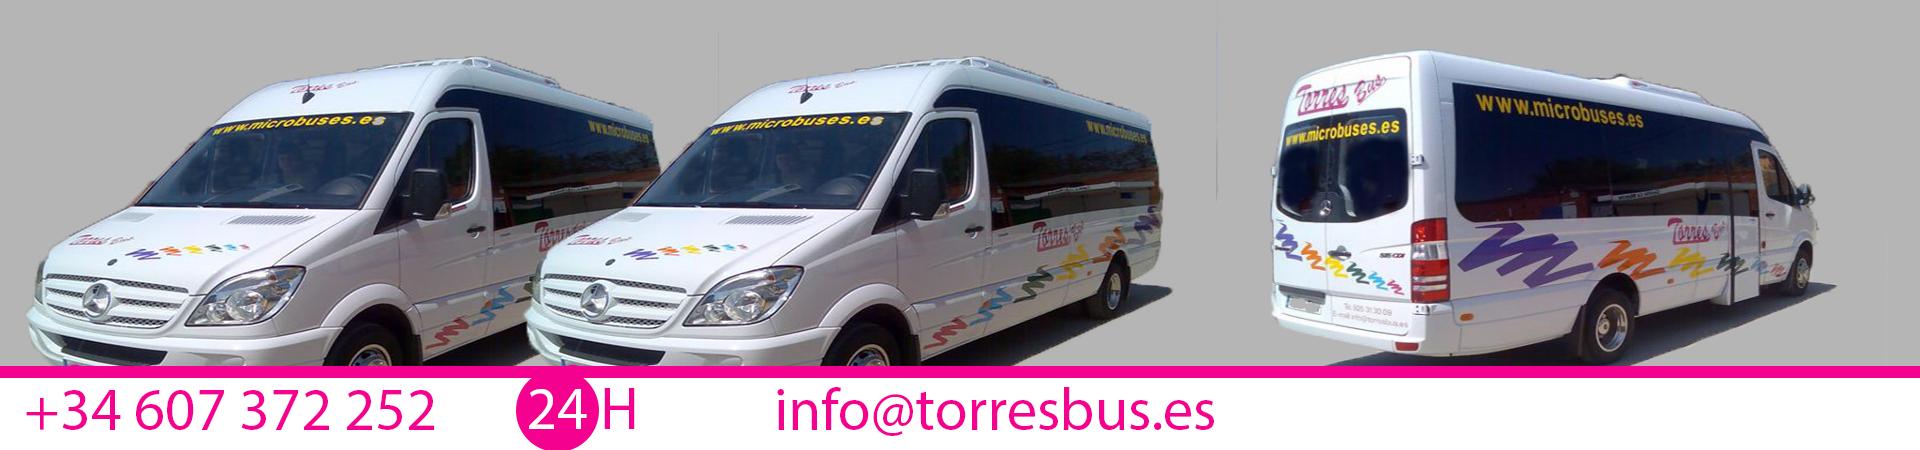 Autocares de alquiler, Autocares de alquiler en madrid, Autocares de alquiler en Toledo, Alquiler de autocares, alquiler de autobuses, alquilar autobus, alquilar autocar